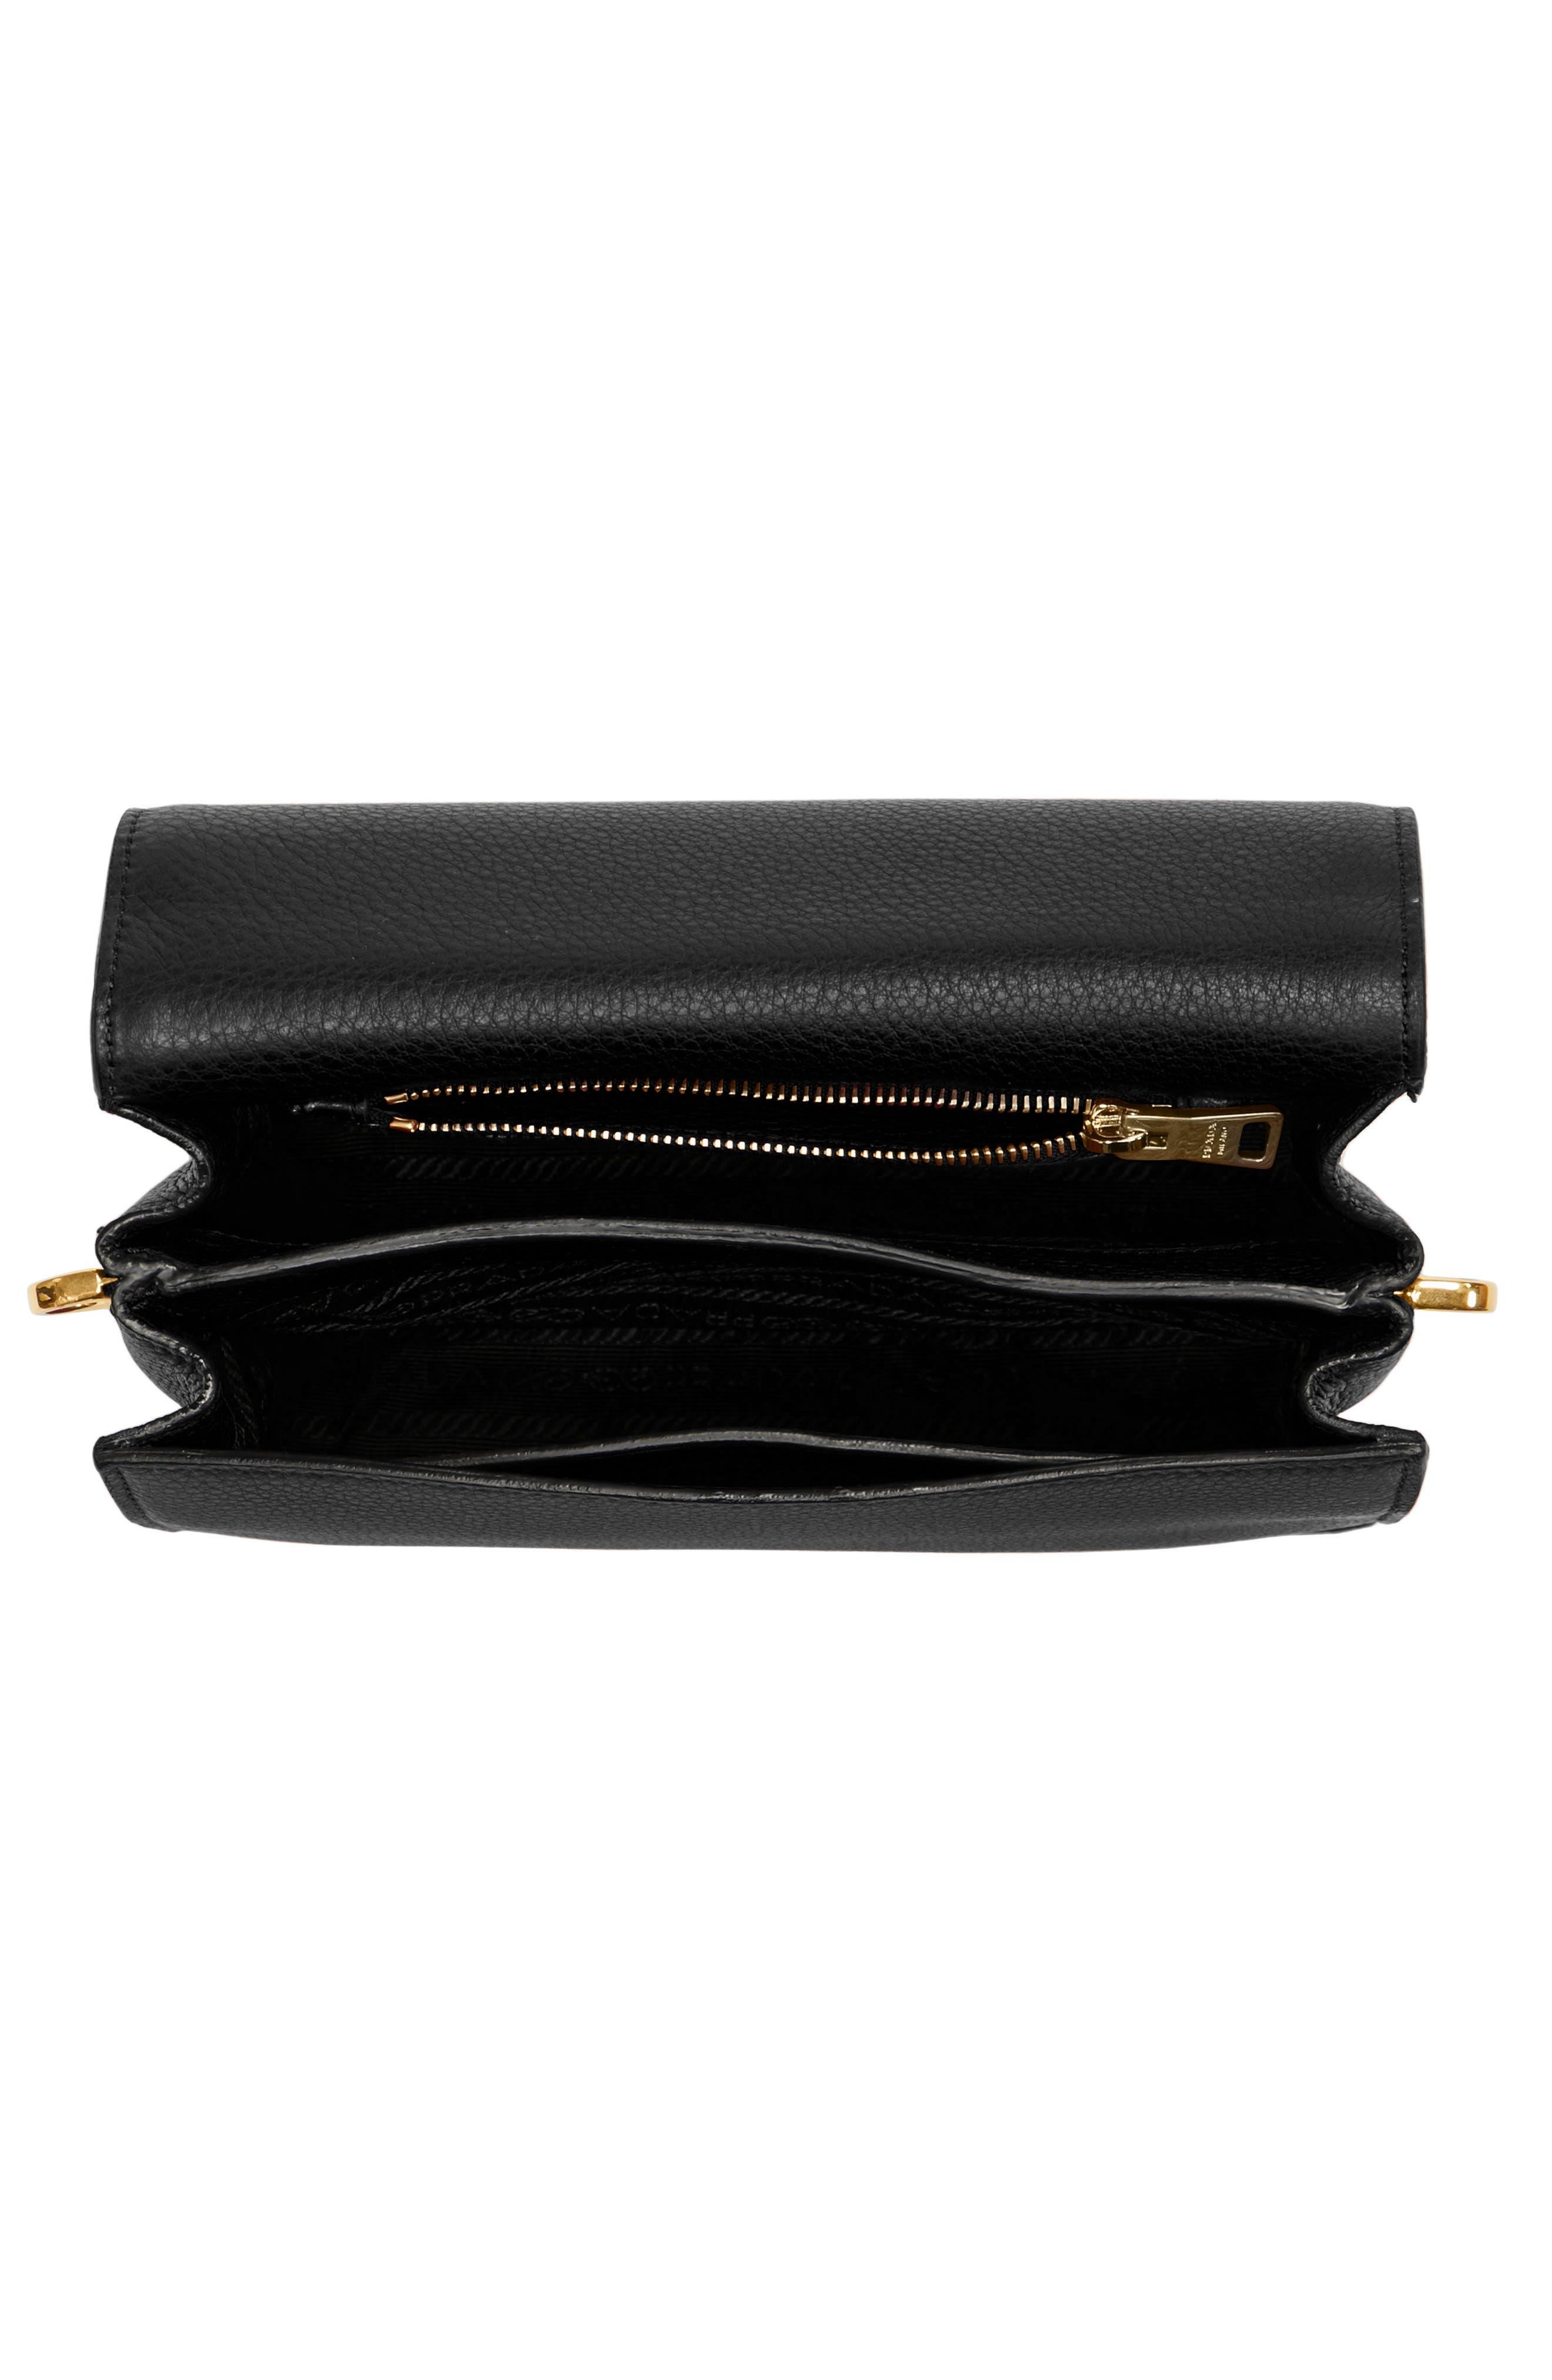 Vitello Daino Double Compartment Leather Shoulder Bag,                             Alternate thumbnail 4, color,                             001